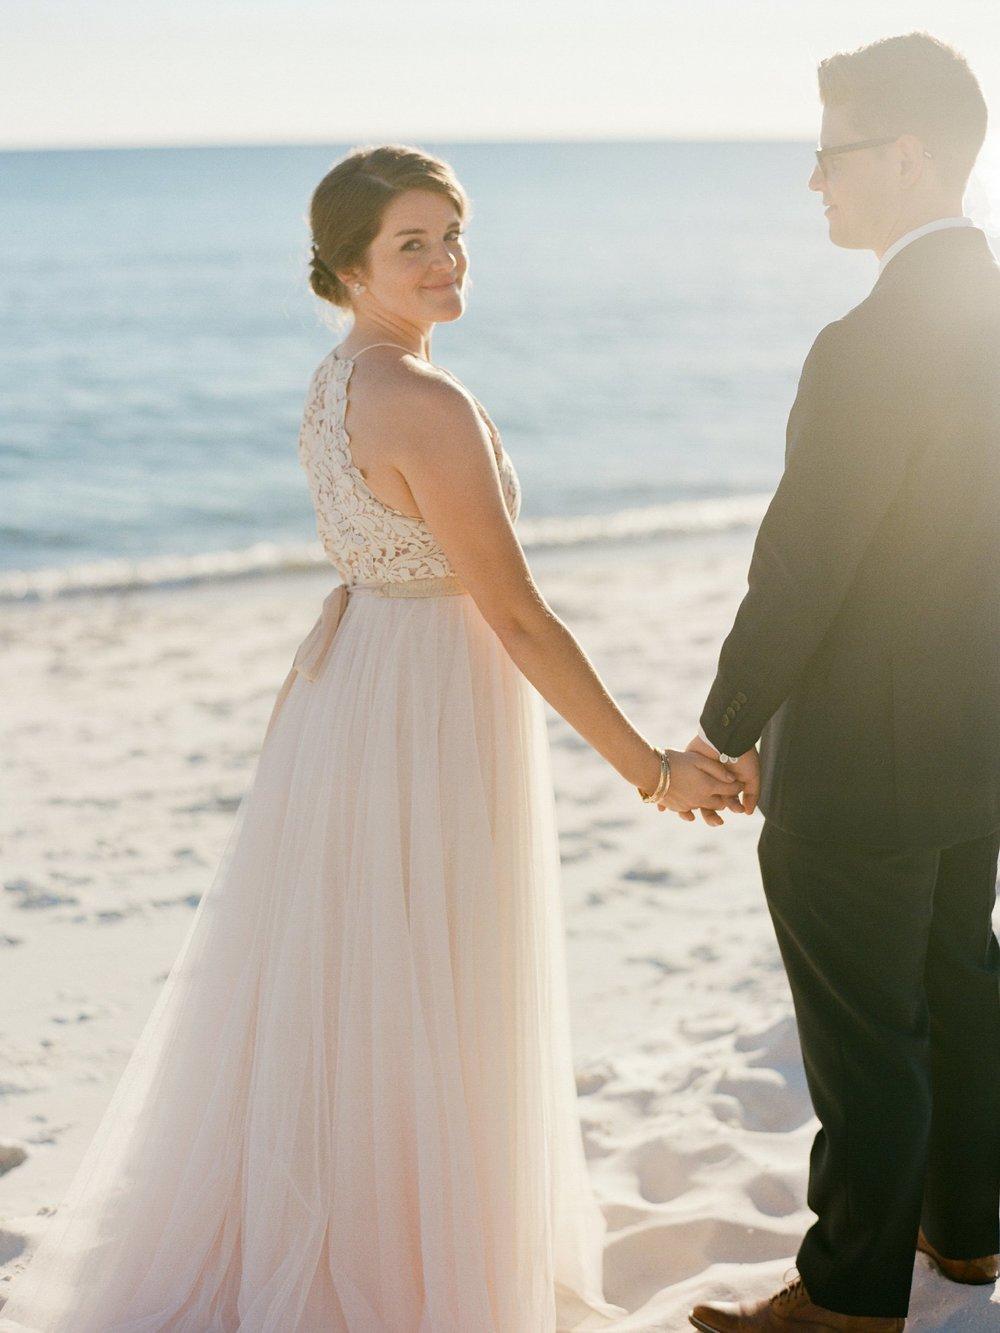 inlet beach wedding 30a wedding inlet beach wedding photographer shannon griffin photography_0044.jpg